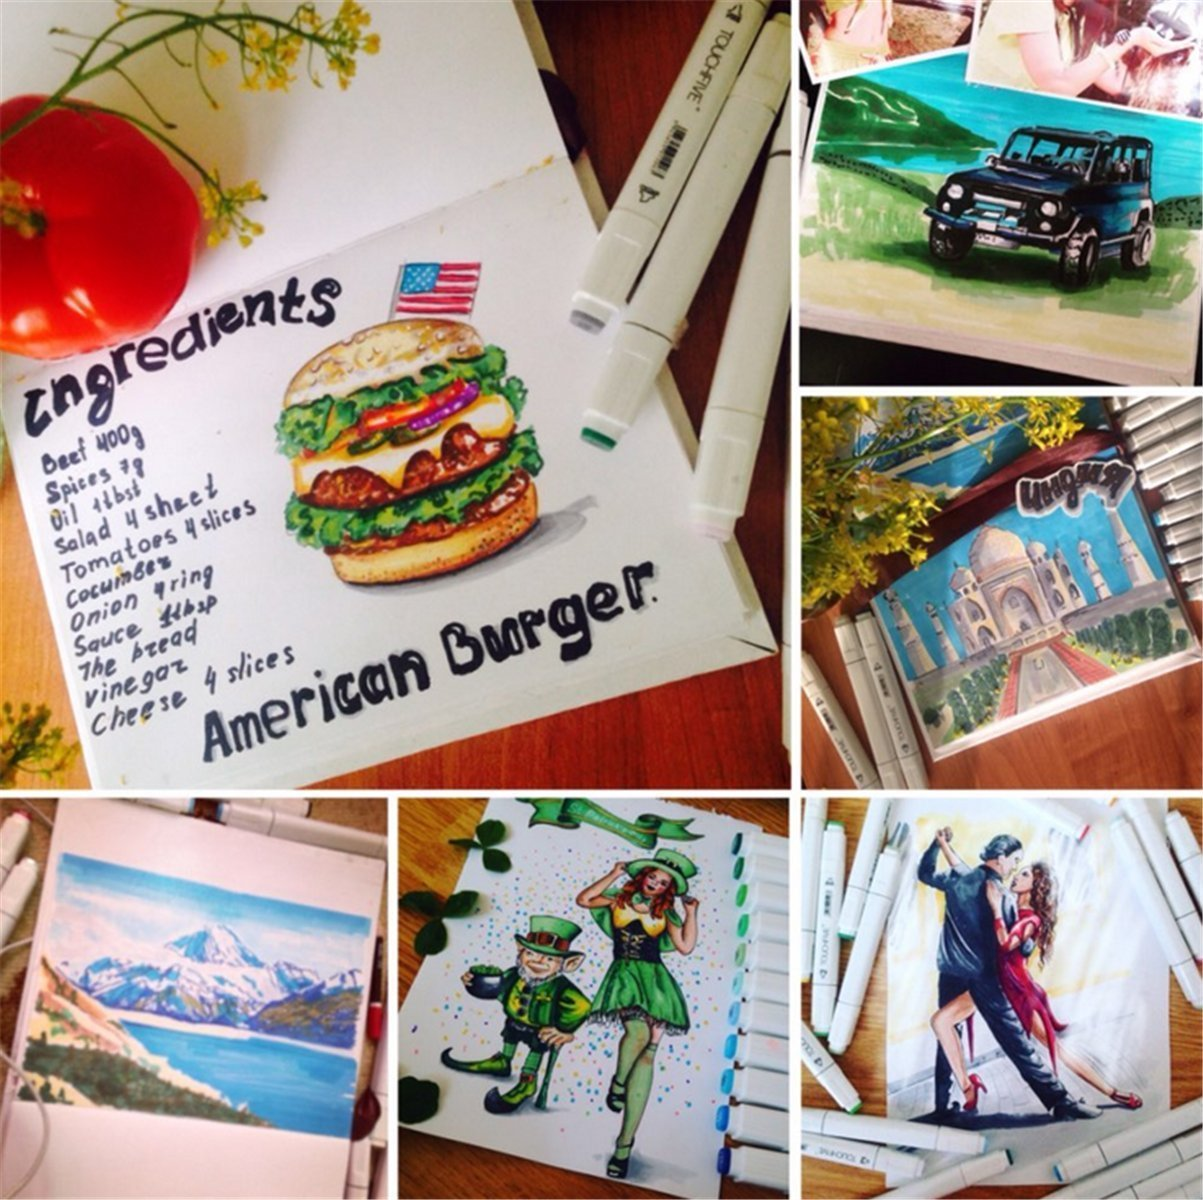 Marcador marcadores permanente bolígrafos, doble puntas animación diseño marcadores Marcador Art Sketch rotulador artista necesario con bolsa de transporte para colorear dibujo pintura y subrayado 168 Colours 53e9a6